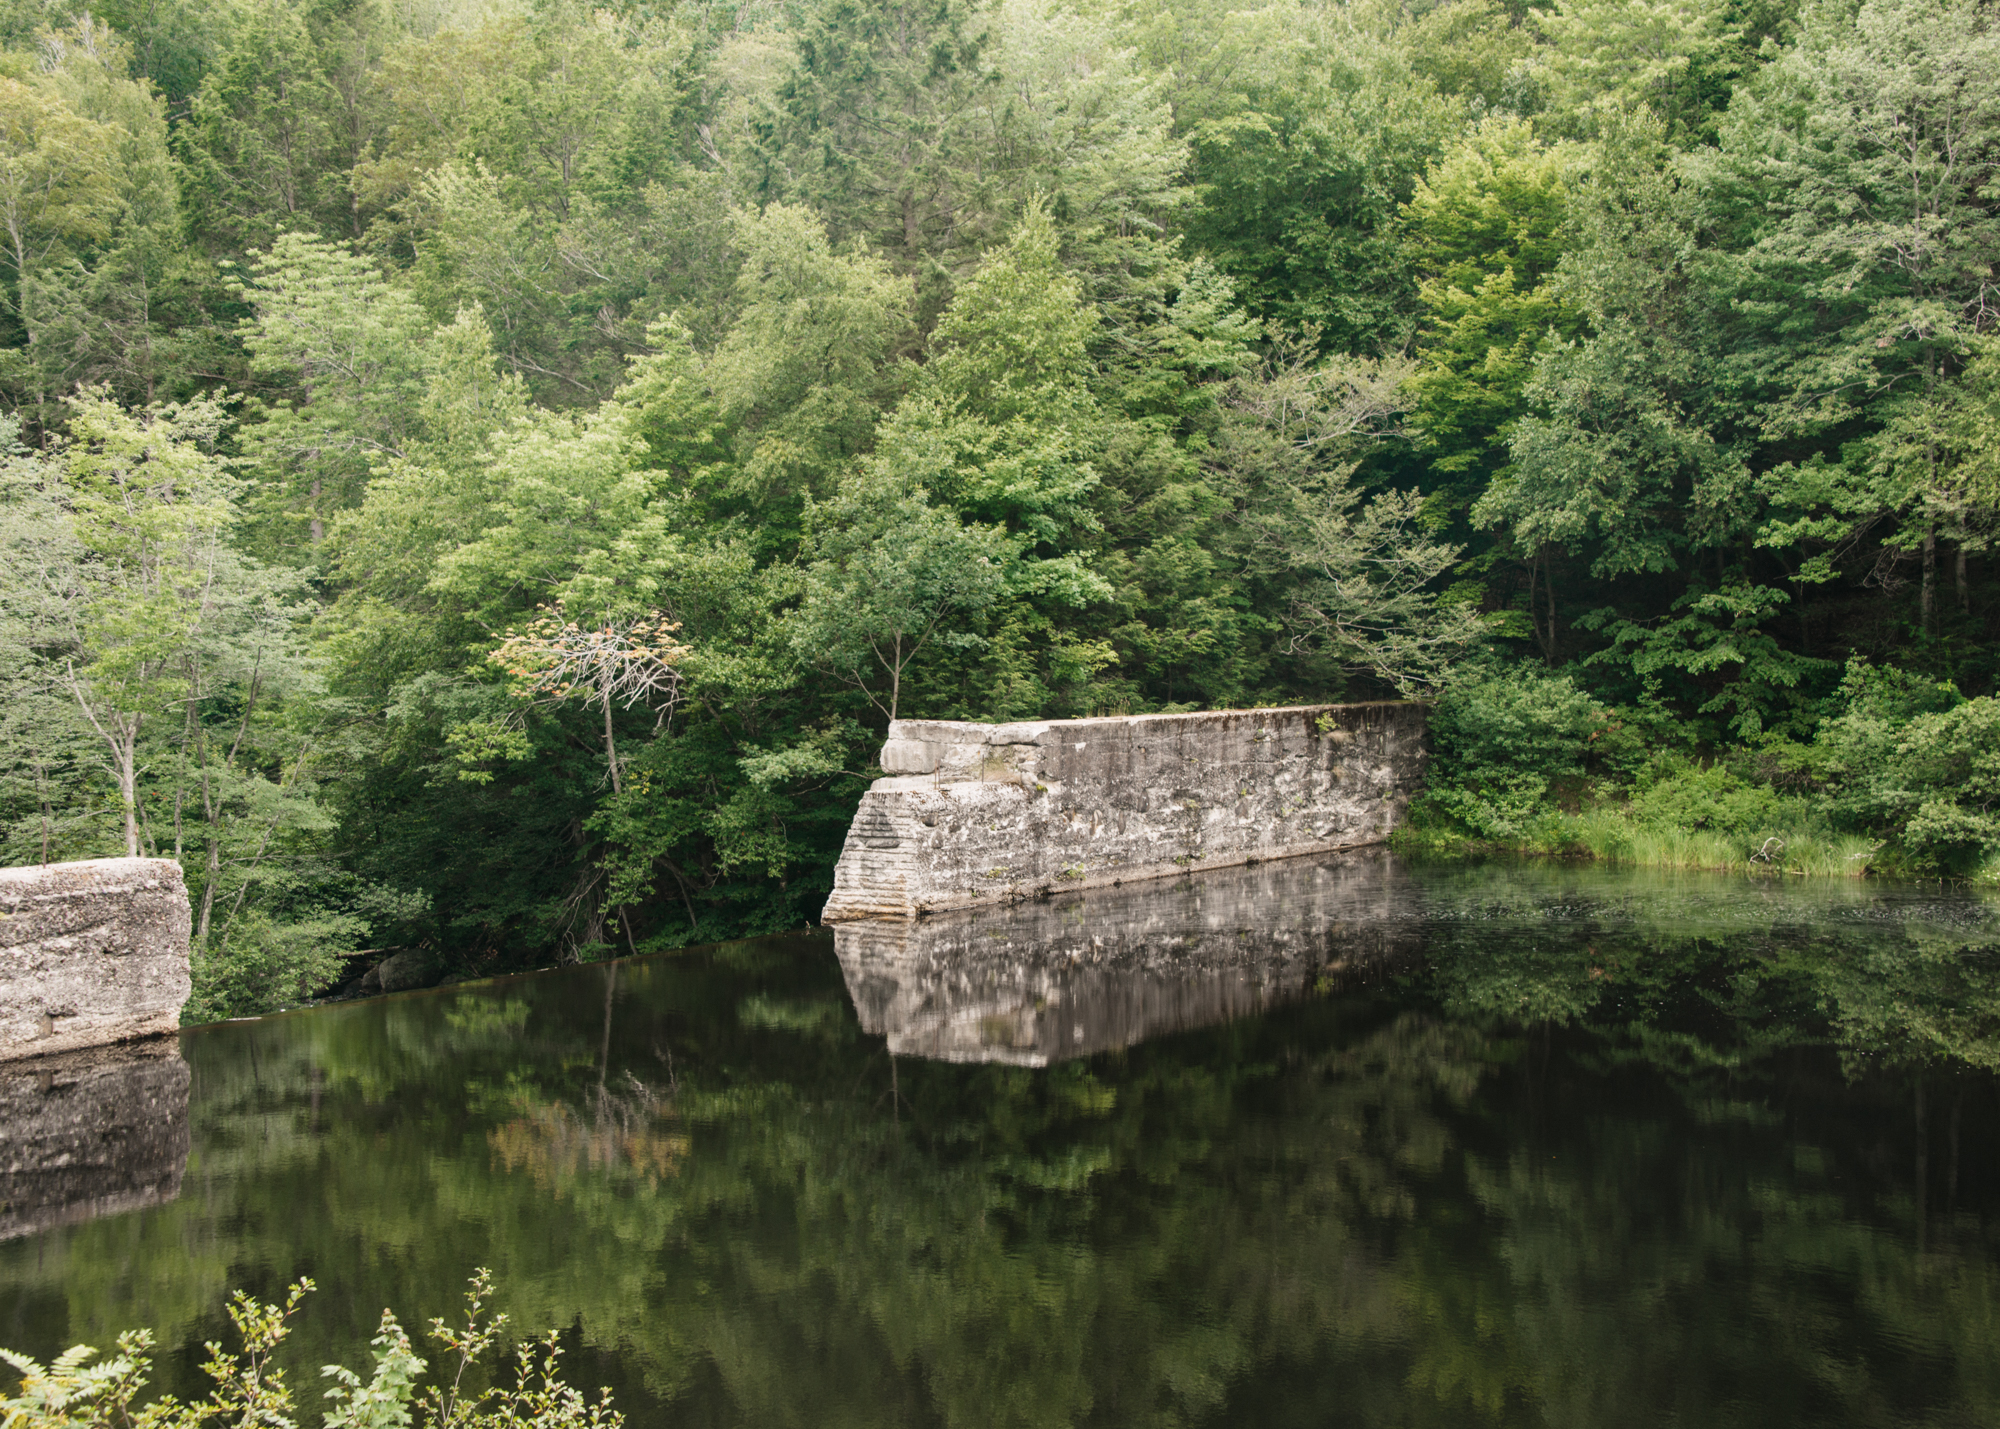 Reflection on MacDowell Lake, Peterborough, New Hampshire.